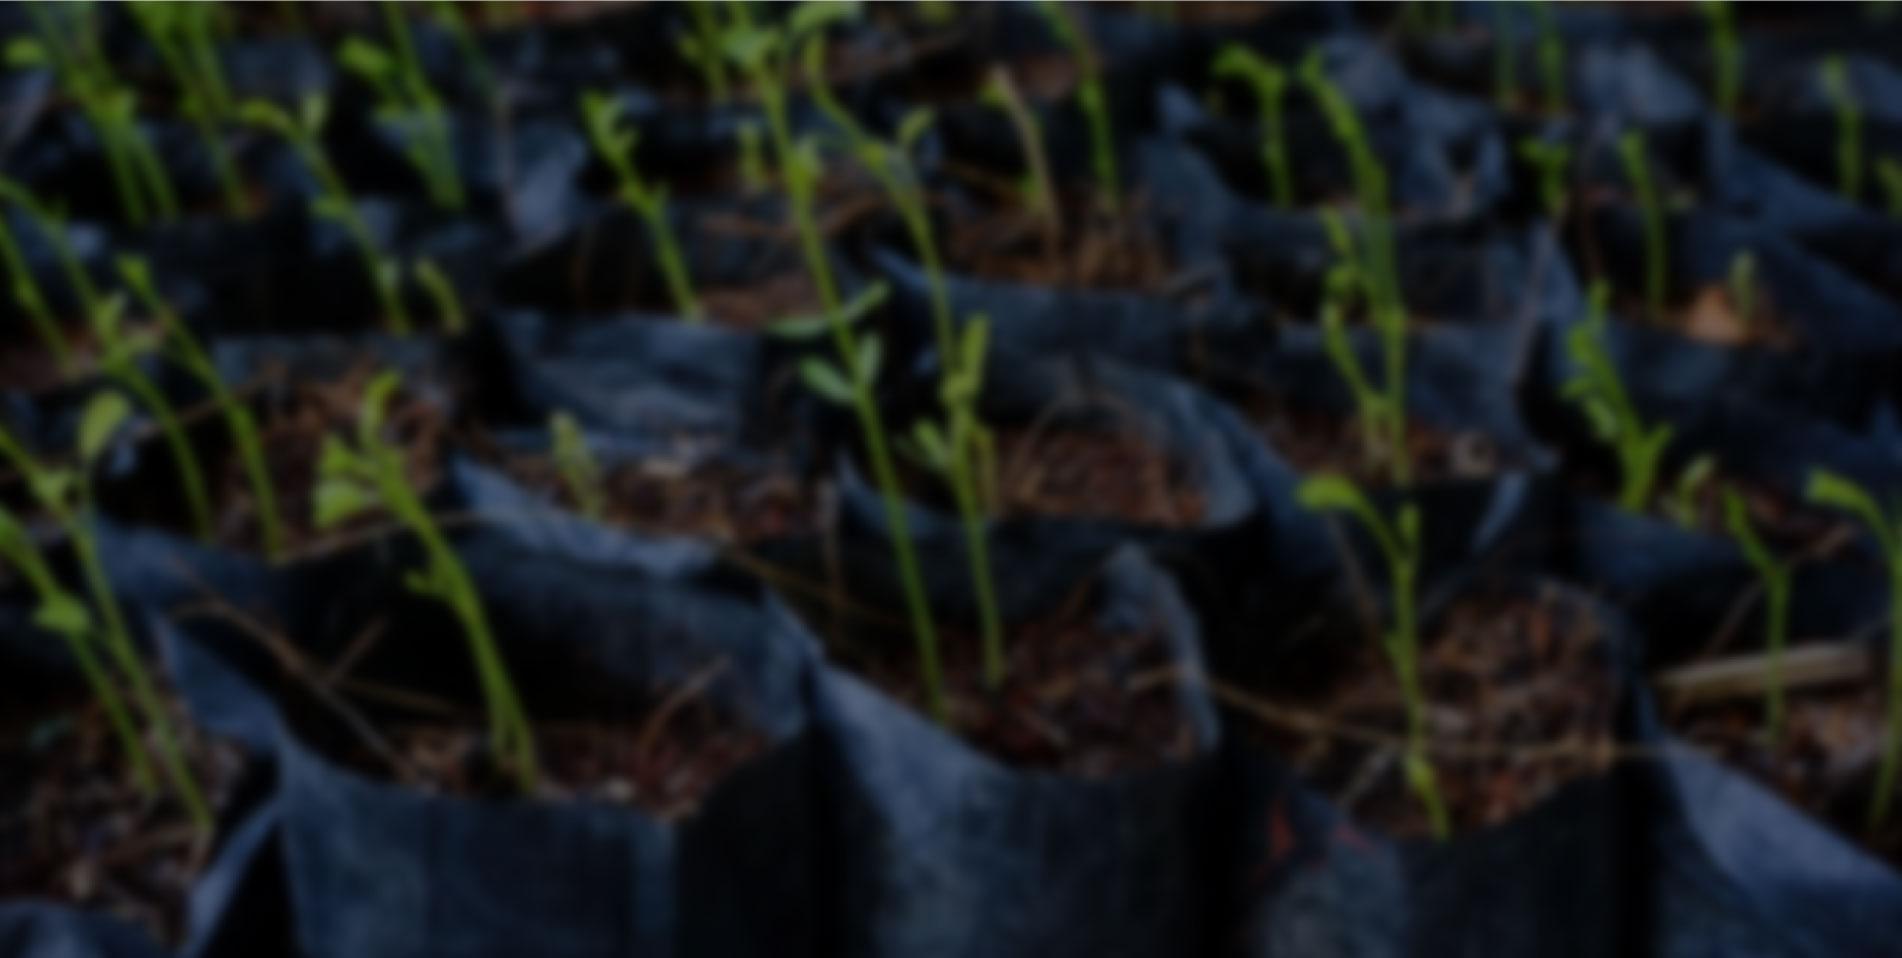 http://34.196.8.203/sites/default/files/revslider/image/polytec-agroindustria.jpg